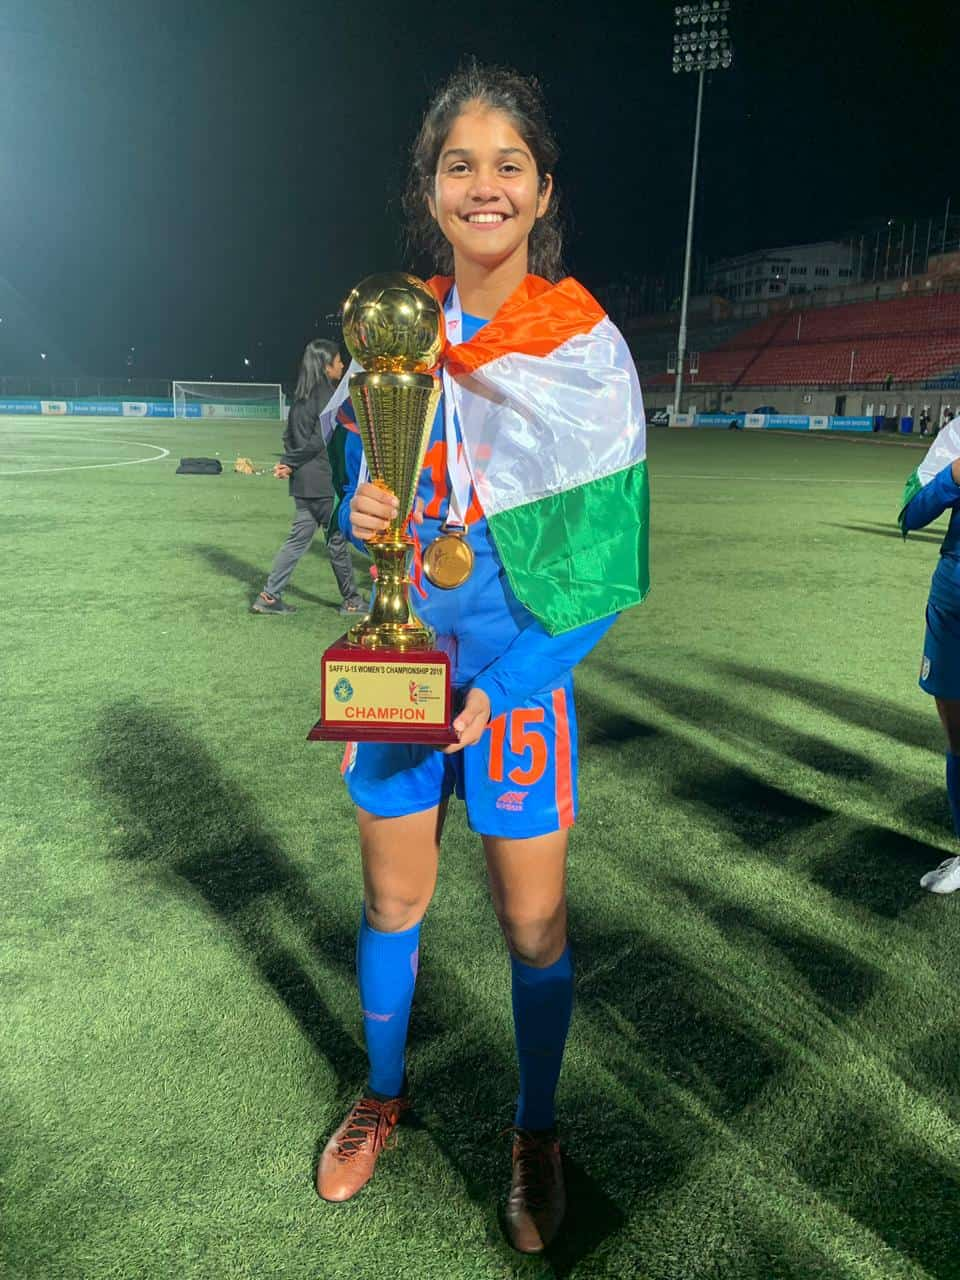 Extraordinary achievement of AVM Juhu's Games Captain, Miss Sai Sankhe